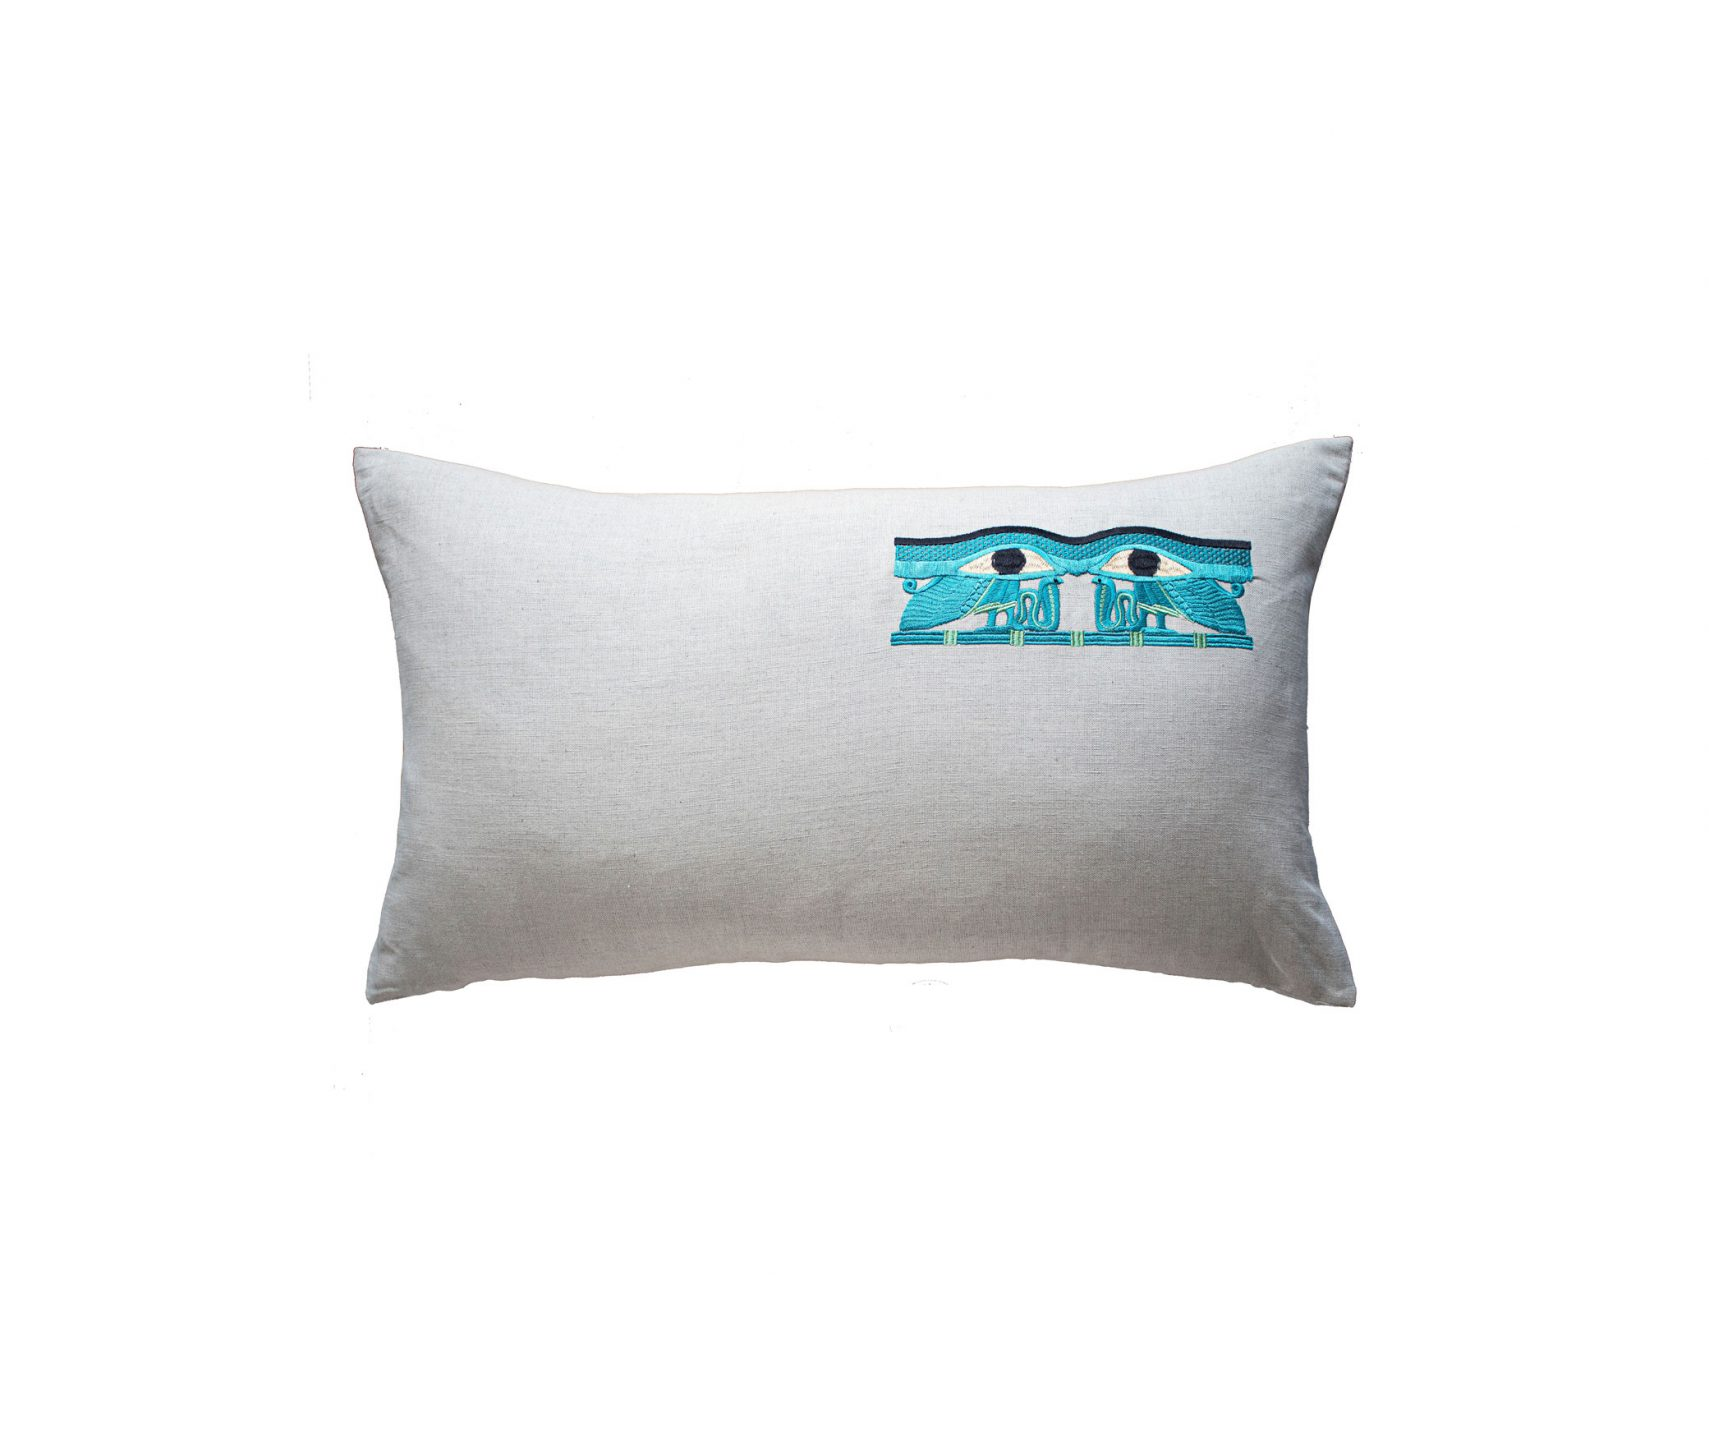 Ann-Gish_Wedjat-Eye-Pillow_int_products